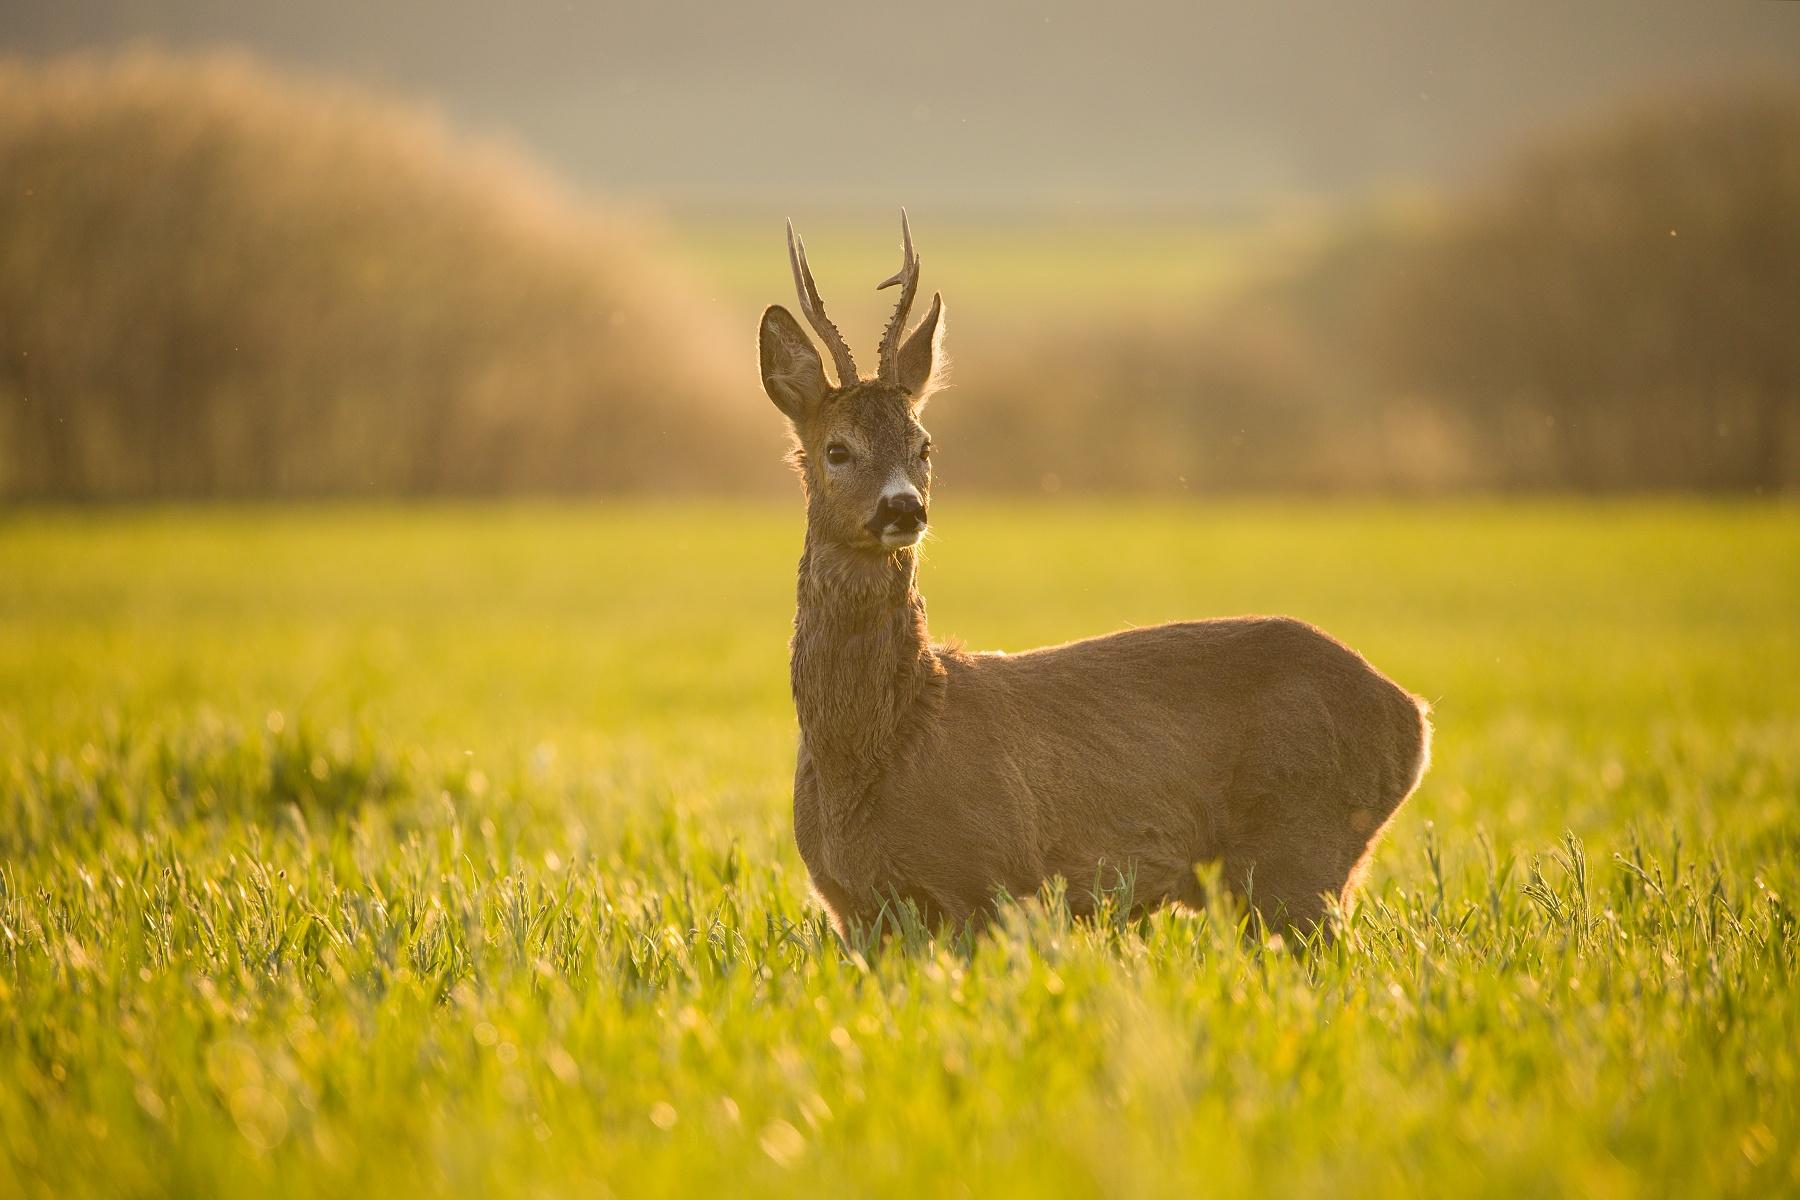 srnec lesný (Capreolus capreolus) Roe deer, Turčianska kotlina, Slovensko Canon EOS 6D mark II, Canon 100-400 mm f4.5-5.6 L IS II USM, 400 mm, f5.6, 1/500, ISO 400, 16. máj 2020